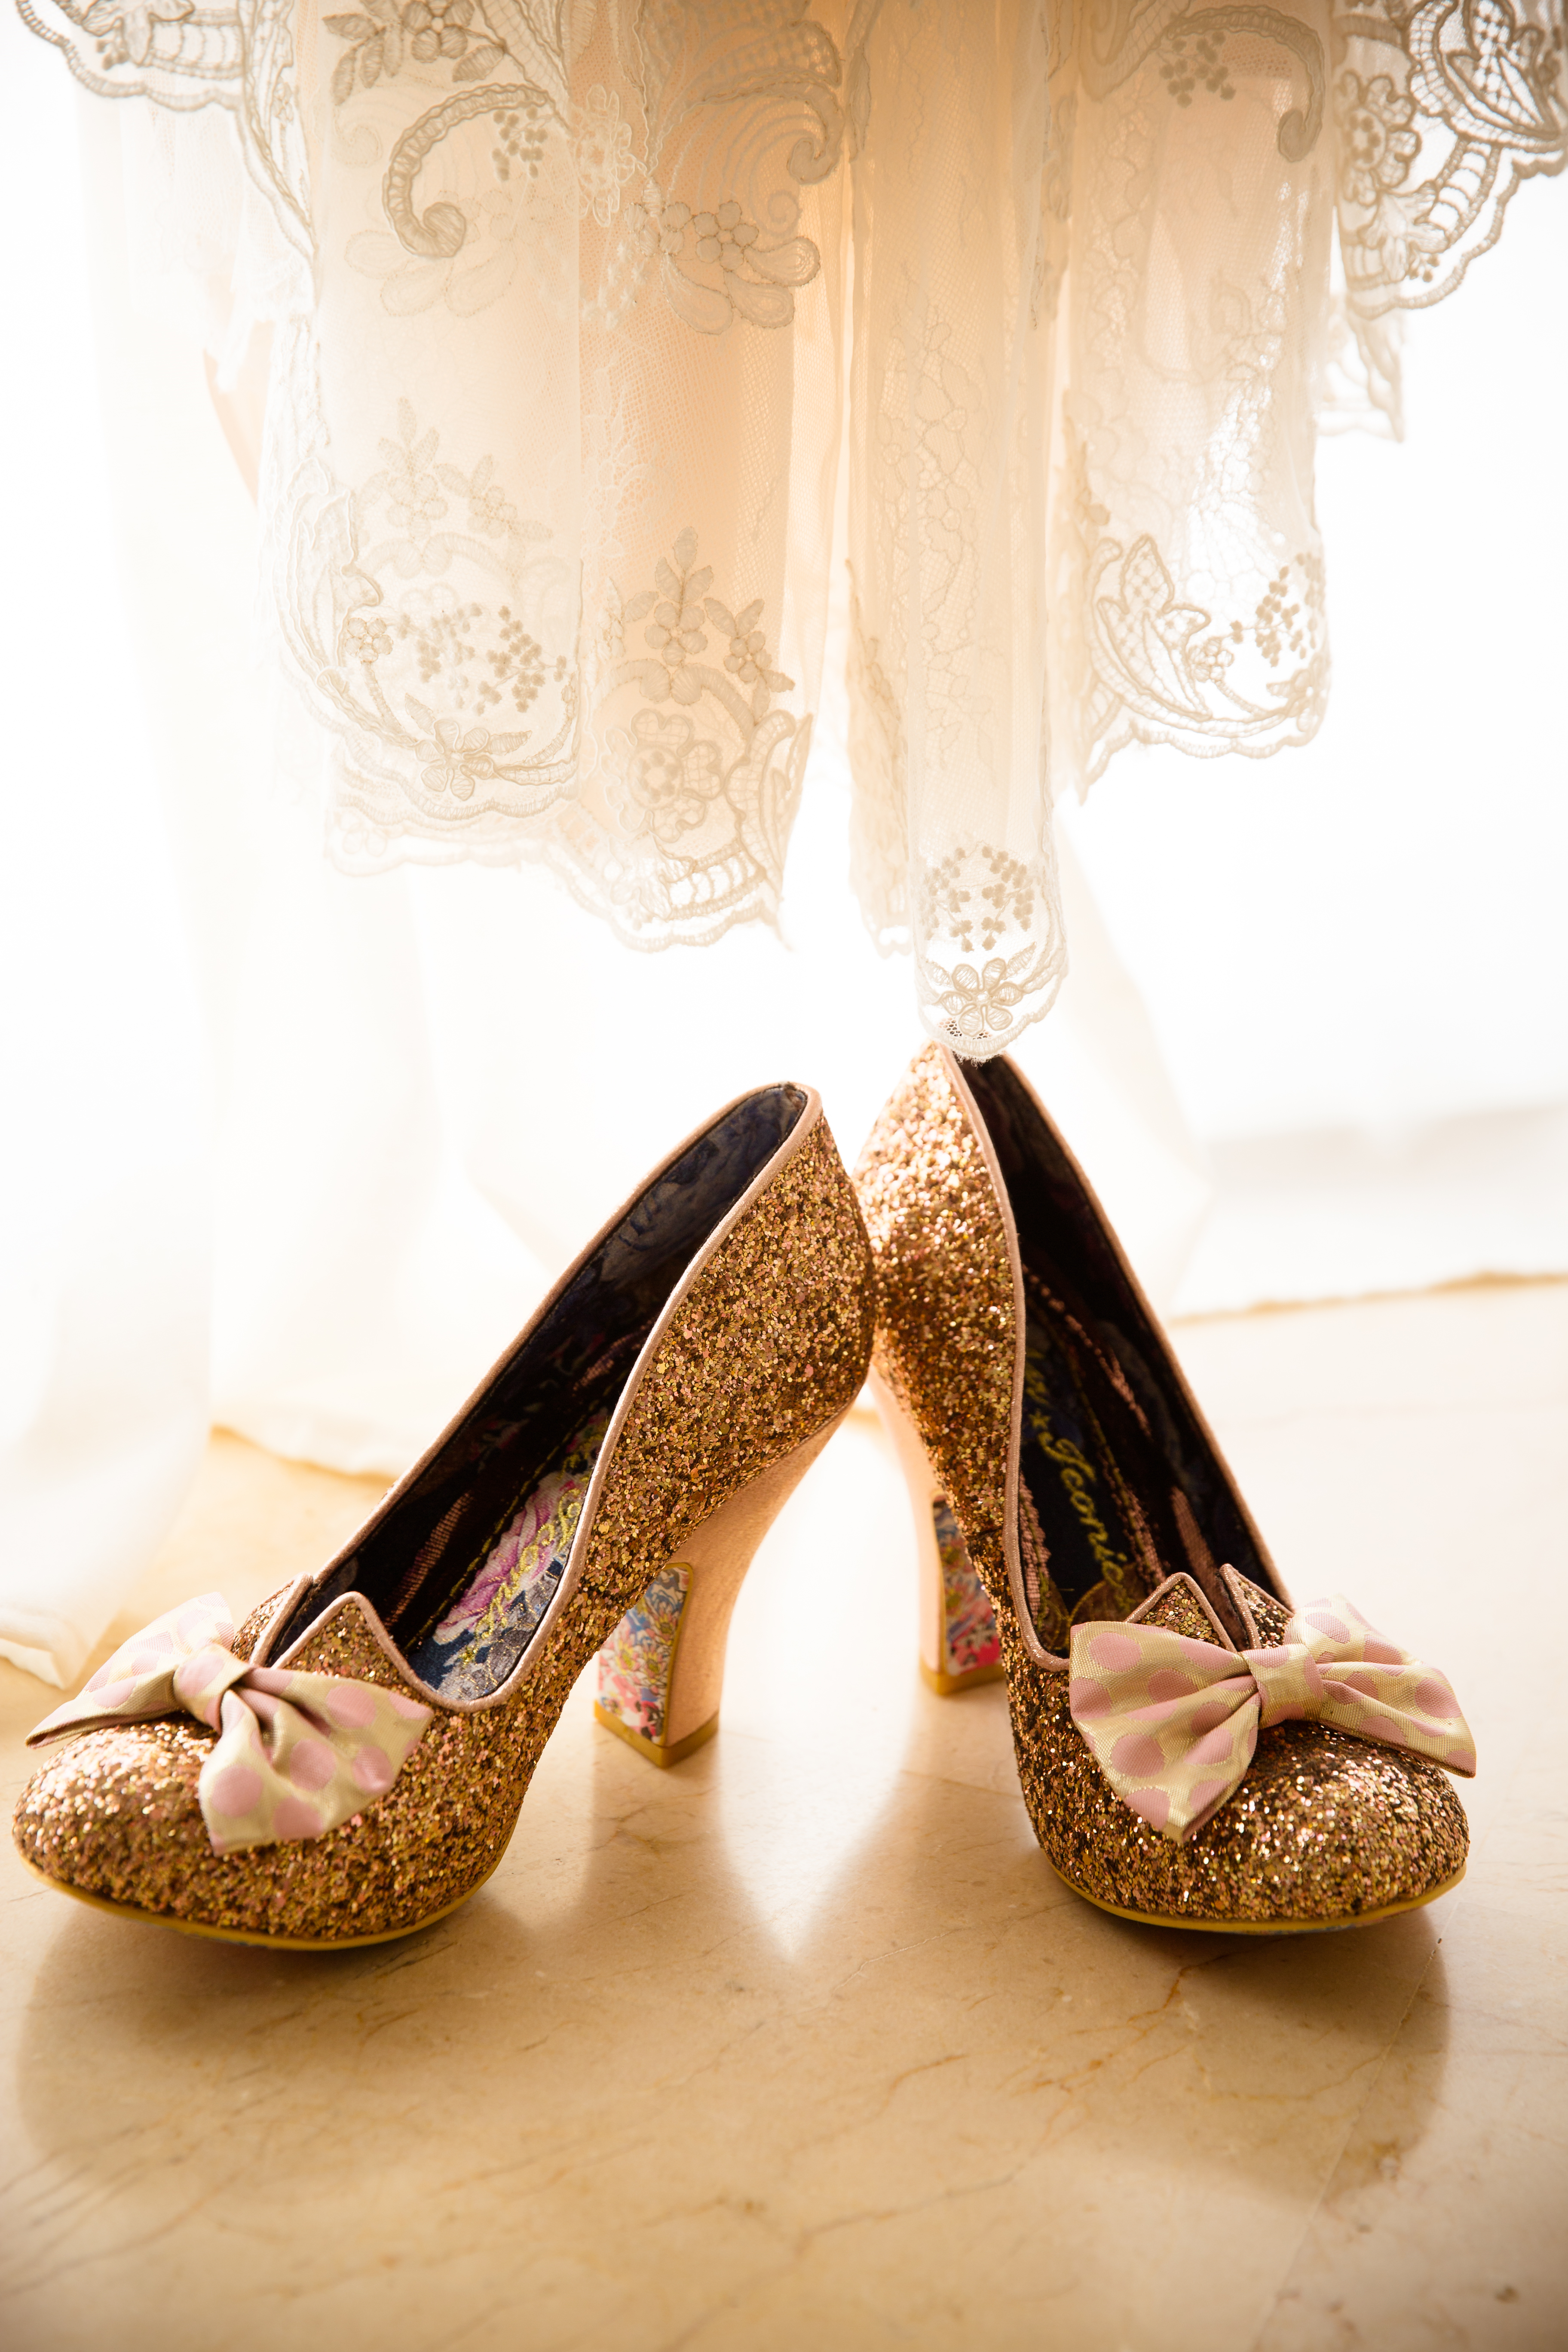 Birdal Shoes